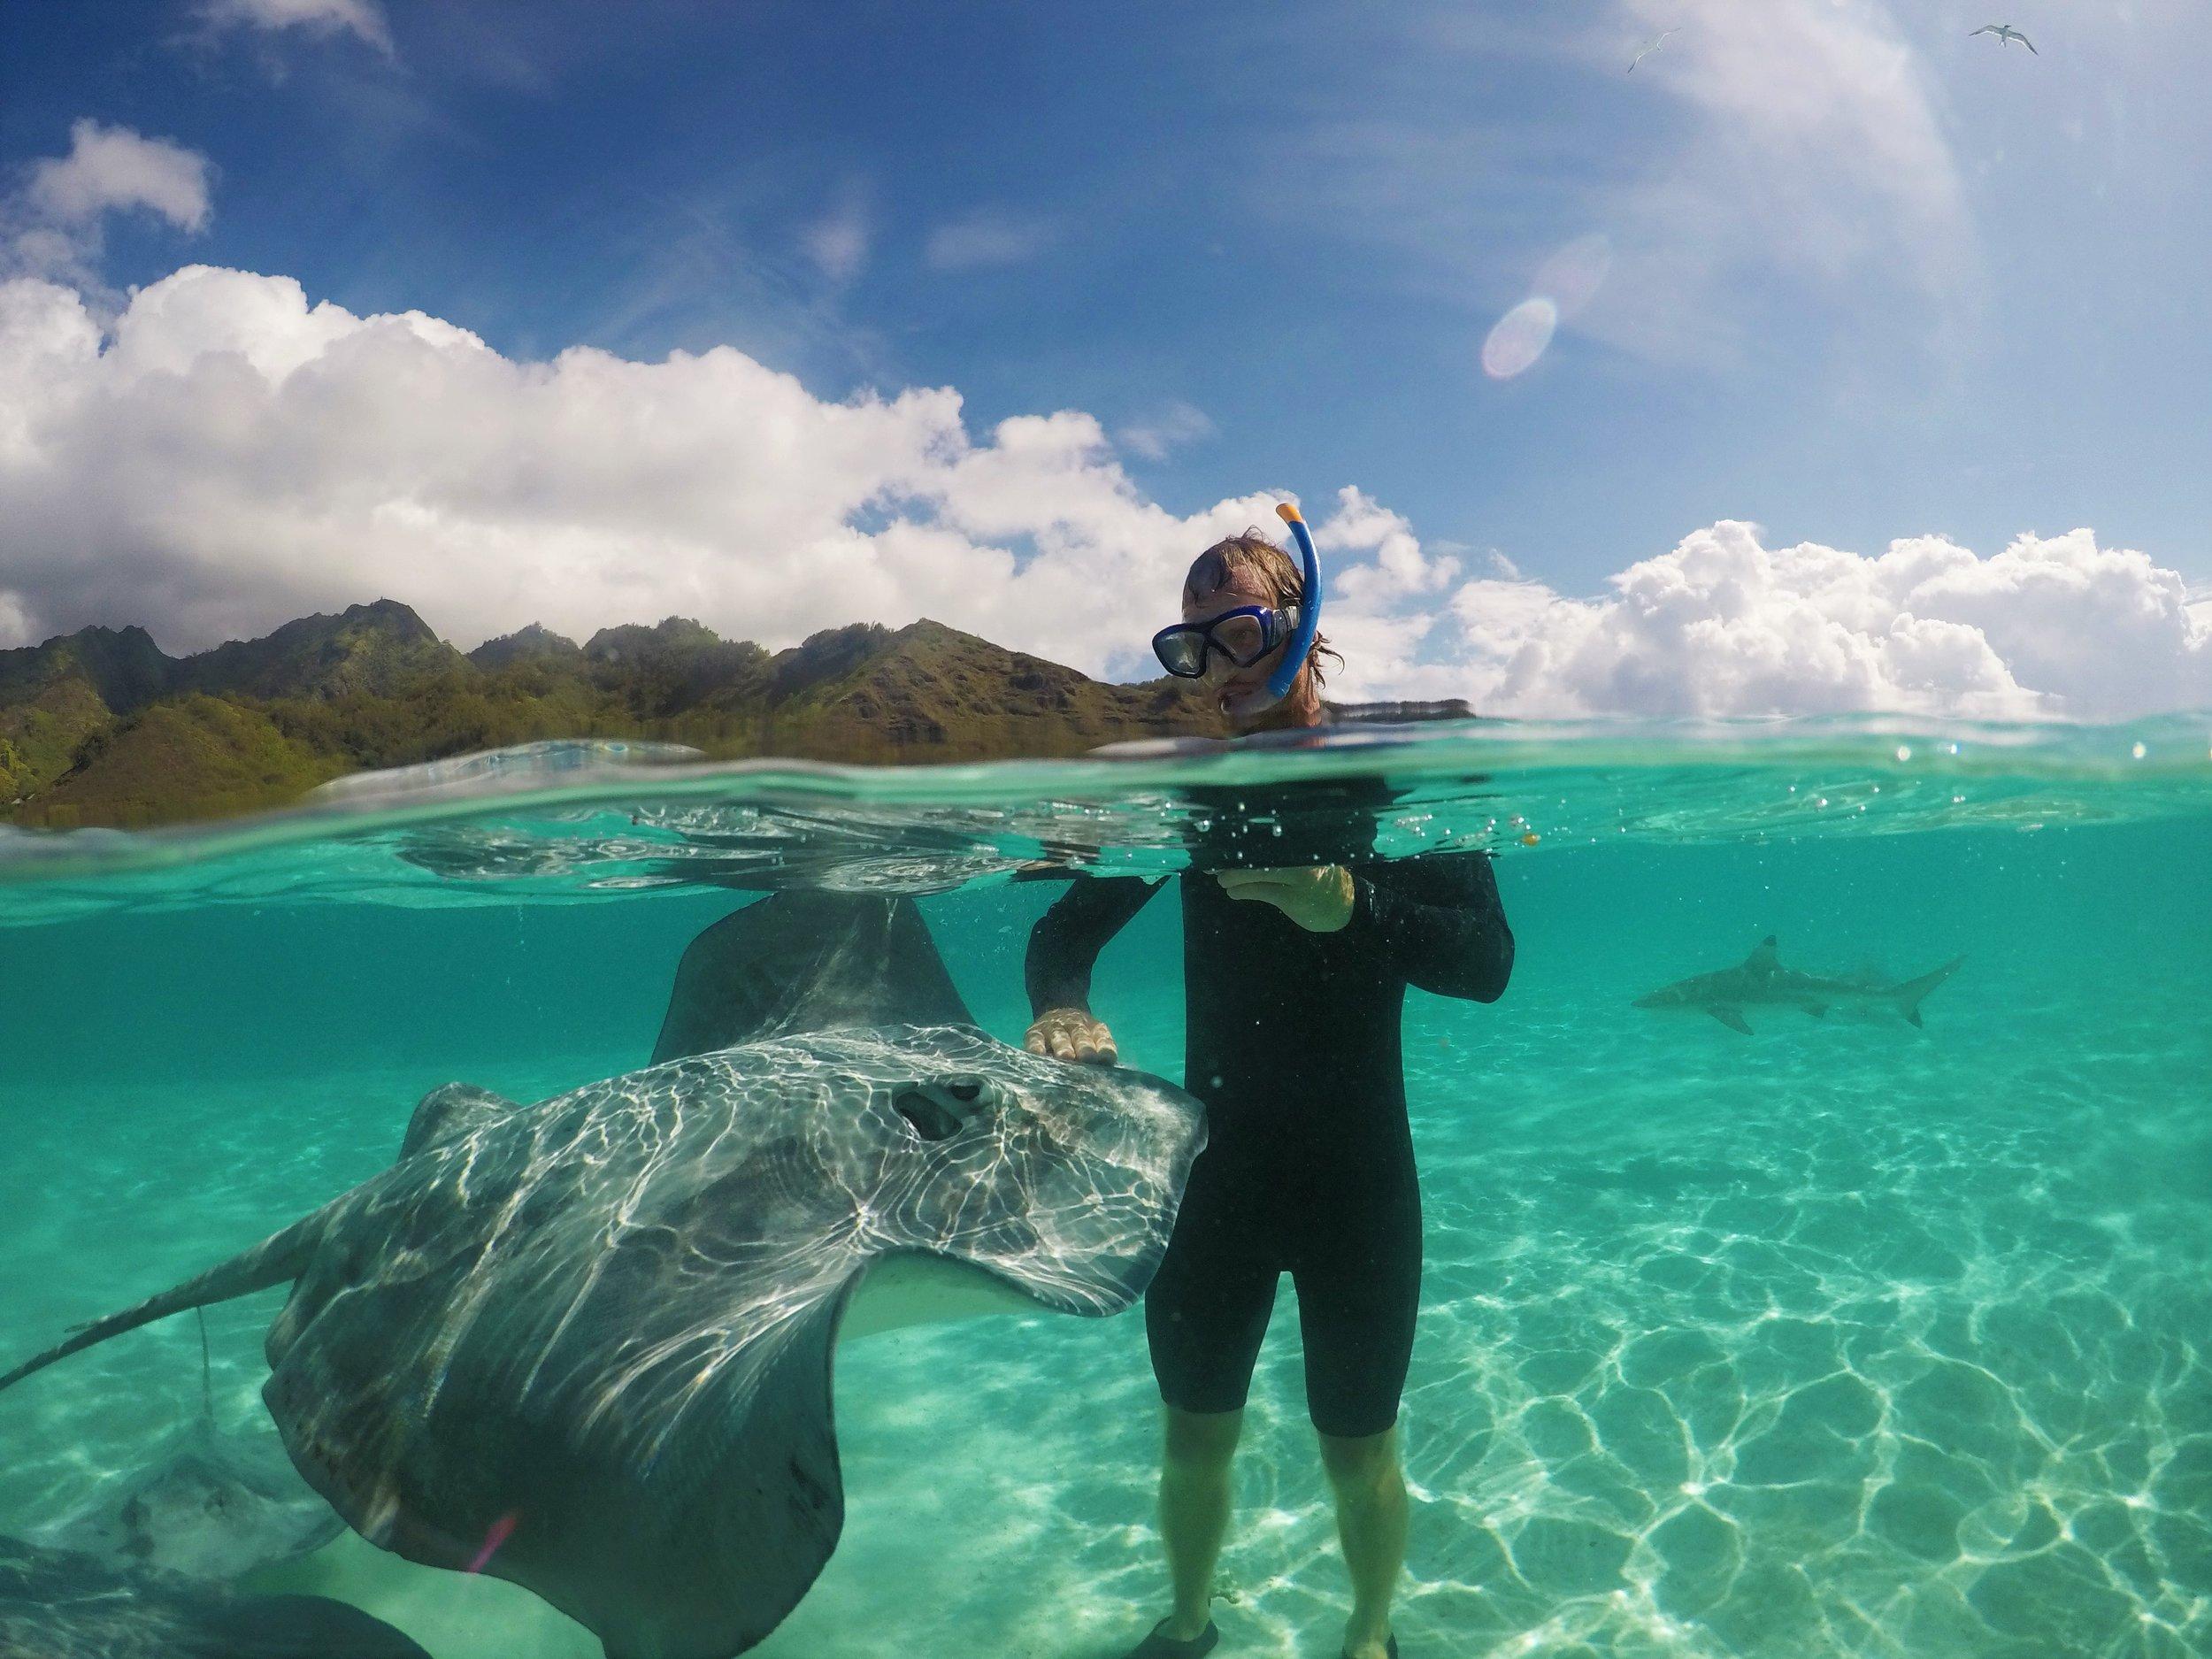 Michael feeding a friendly ray, as sharks circle